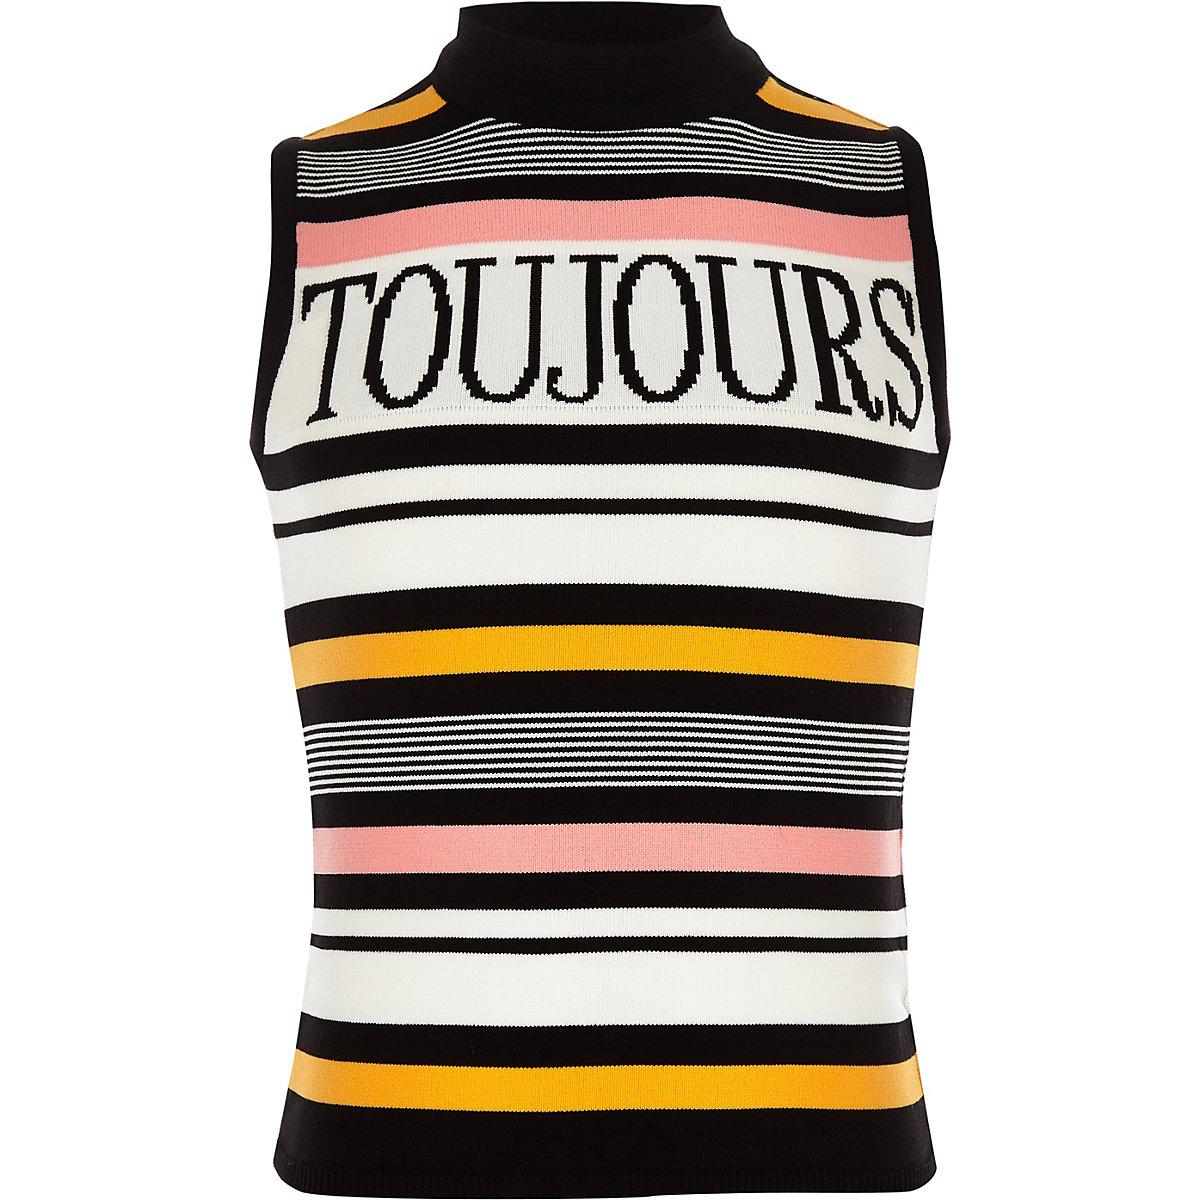 Girls black 'Toujours' stripe tank top